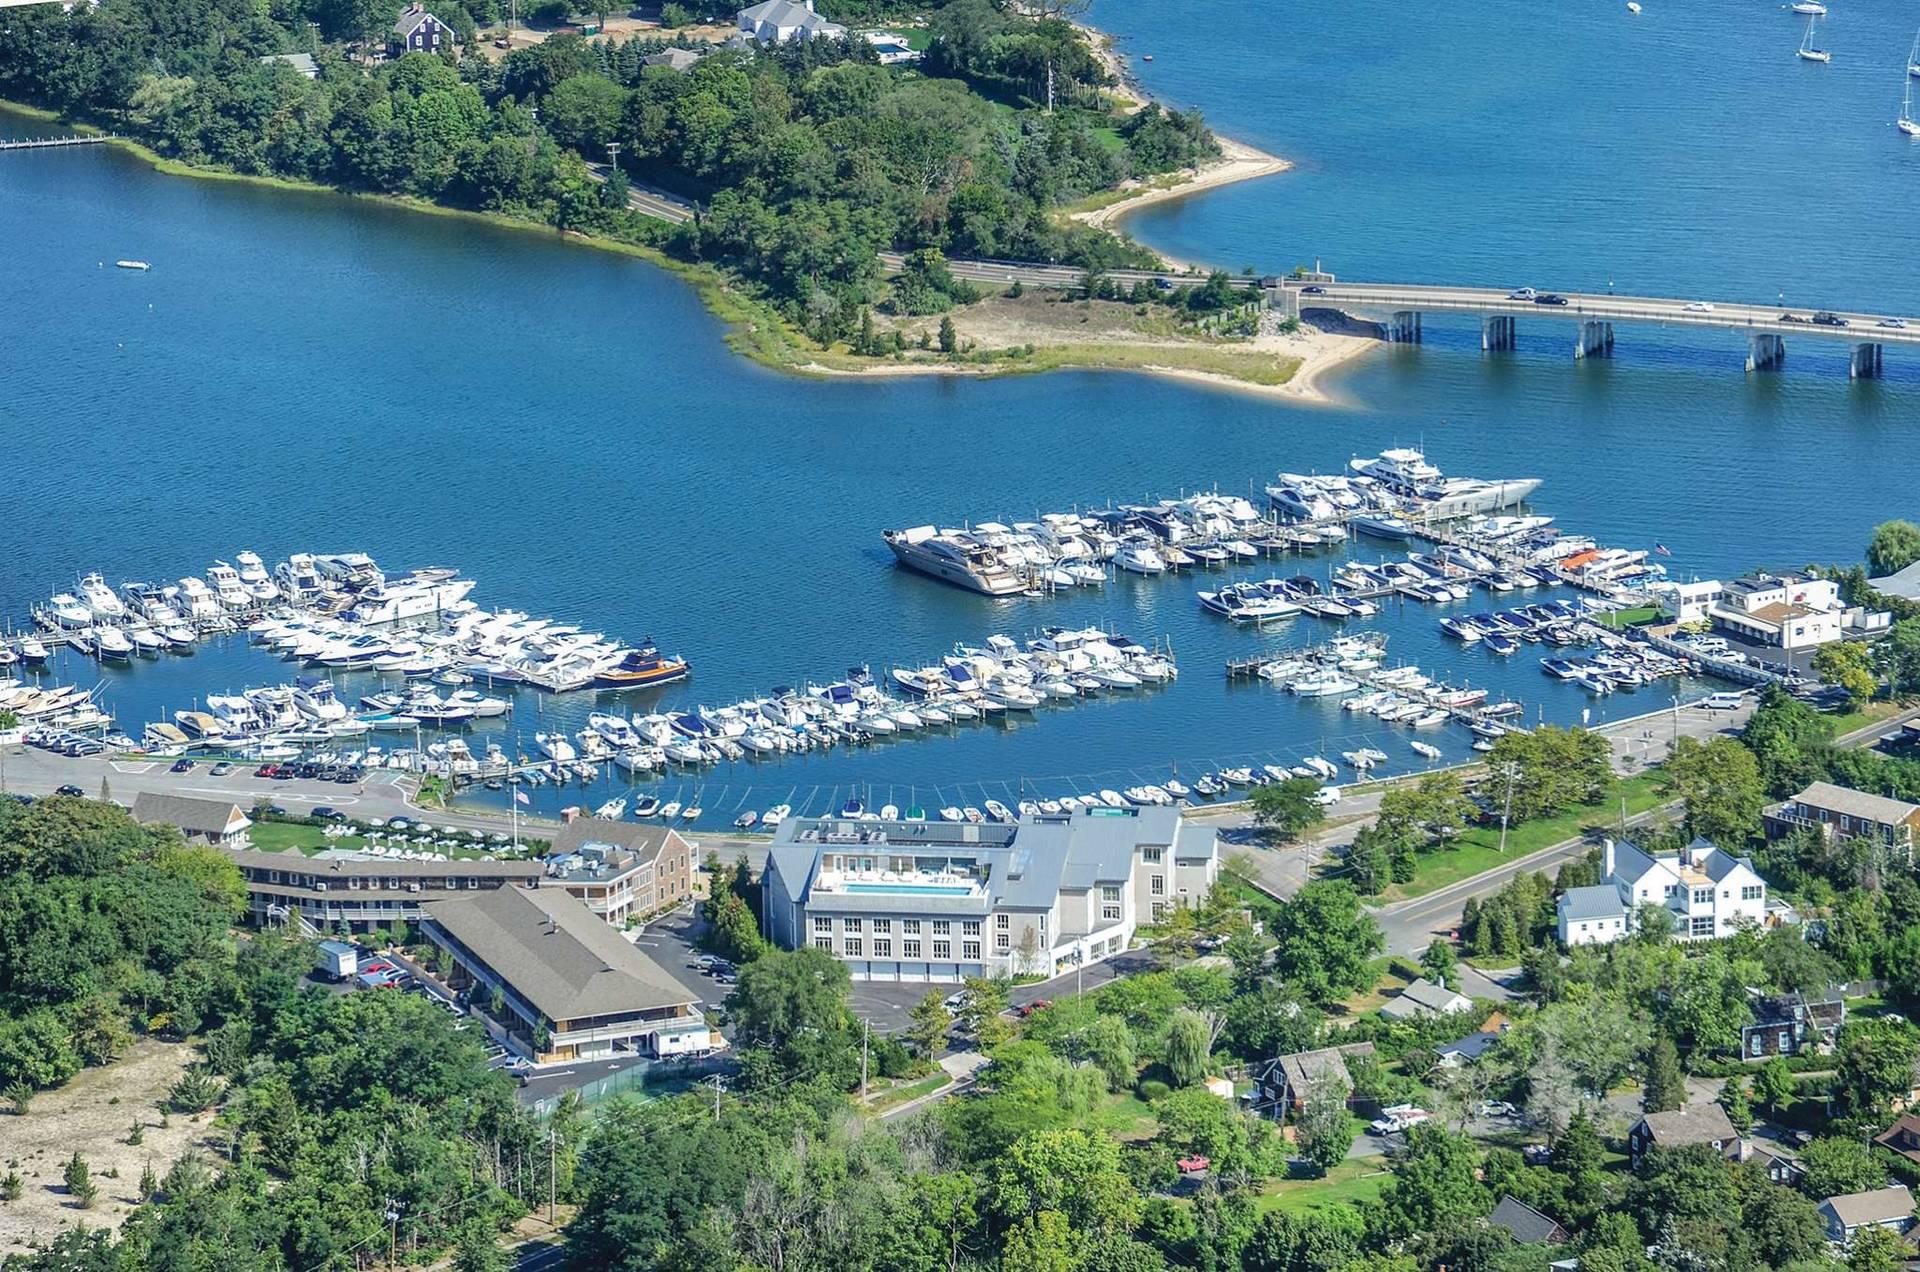 Condominium for Sale at Harbor's Edge - Resort Lifestyle In Sag Harbor 21 West Water Street, 2a, Sag Harbor, New York